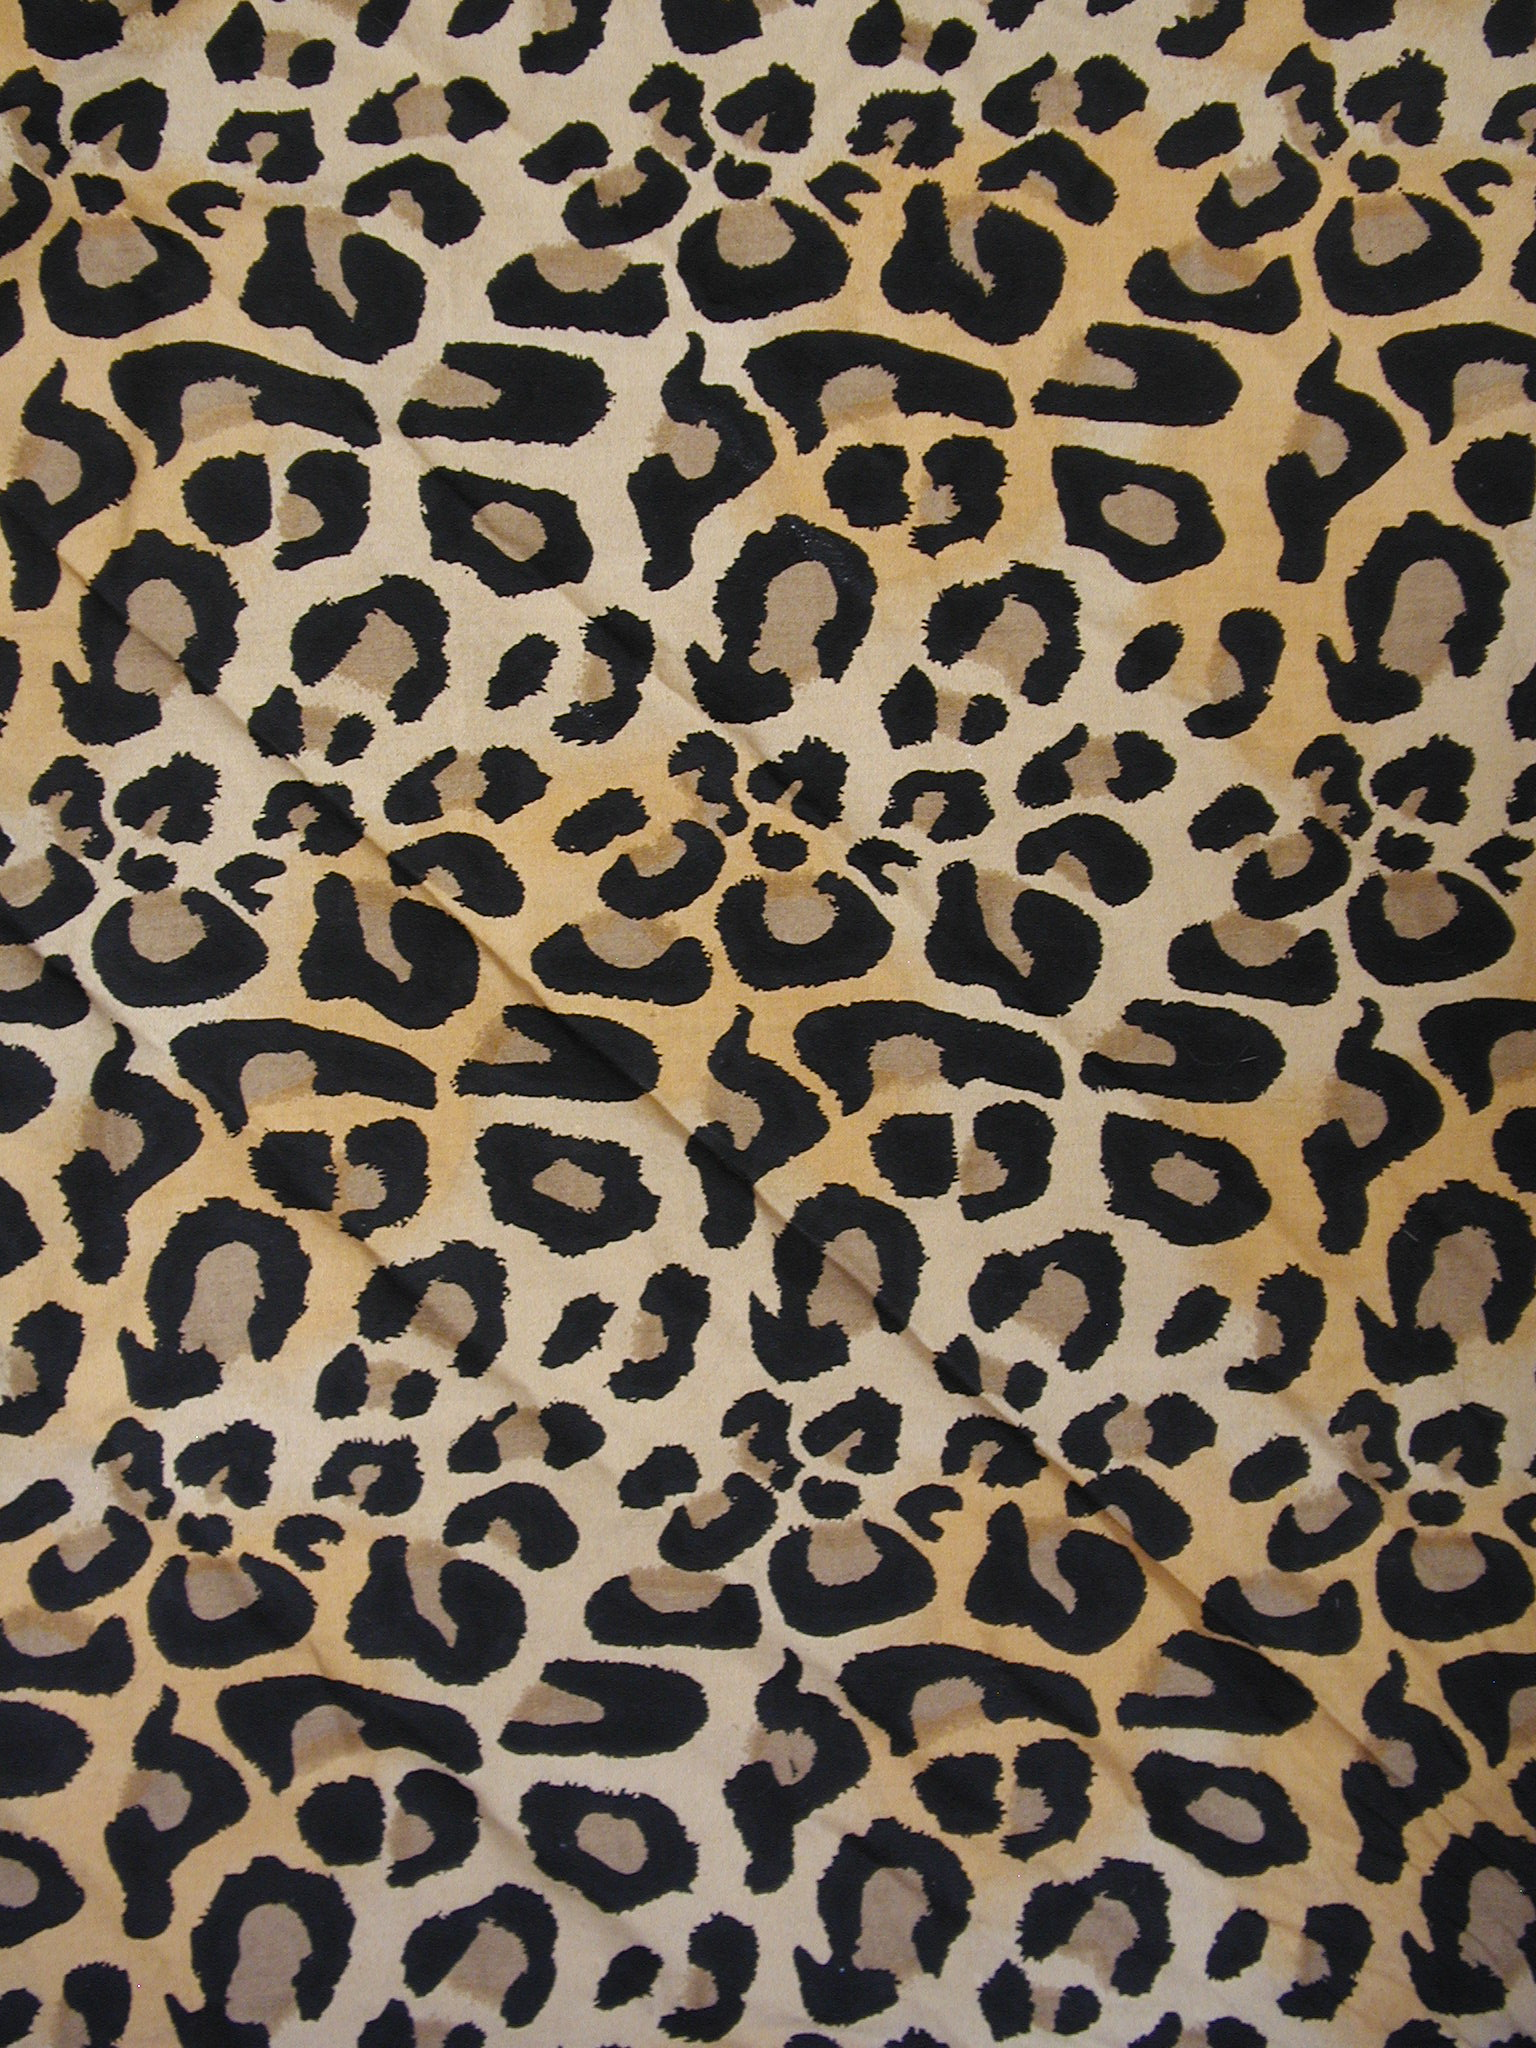 best animal wallpapers leopard print wallpaper